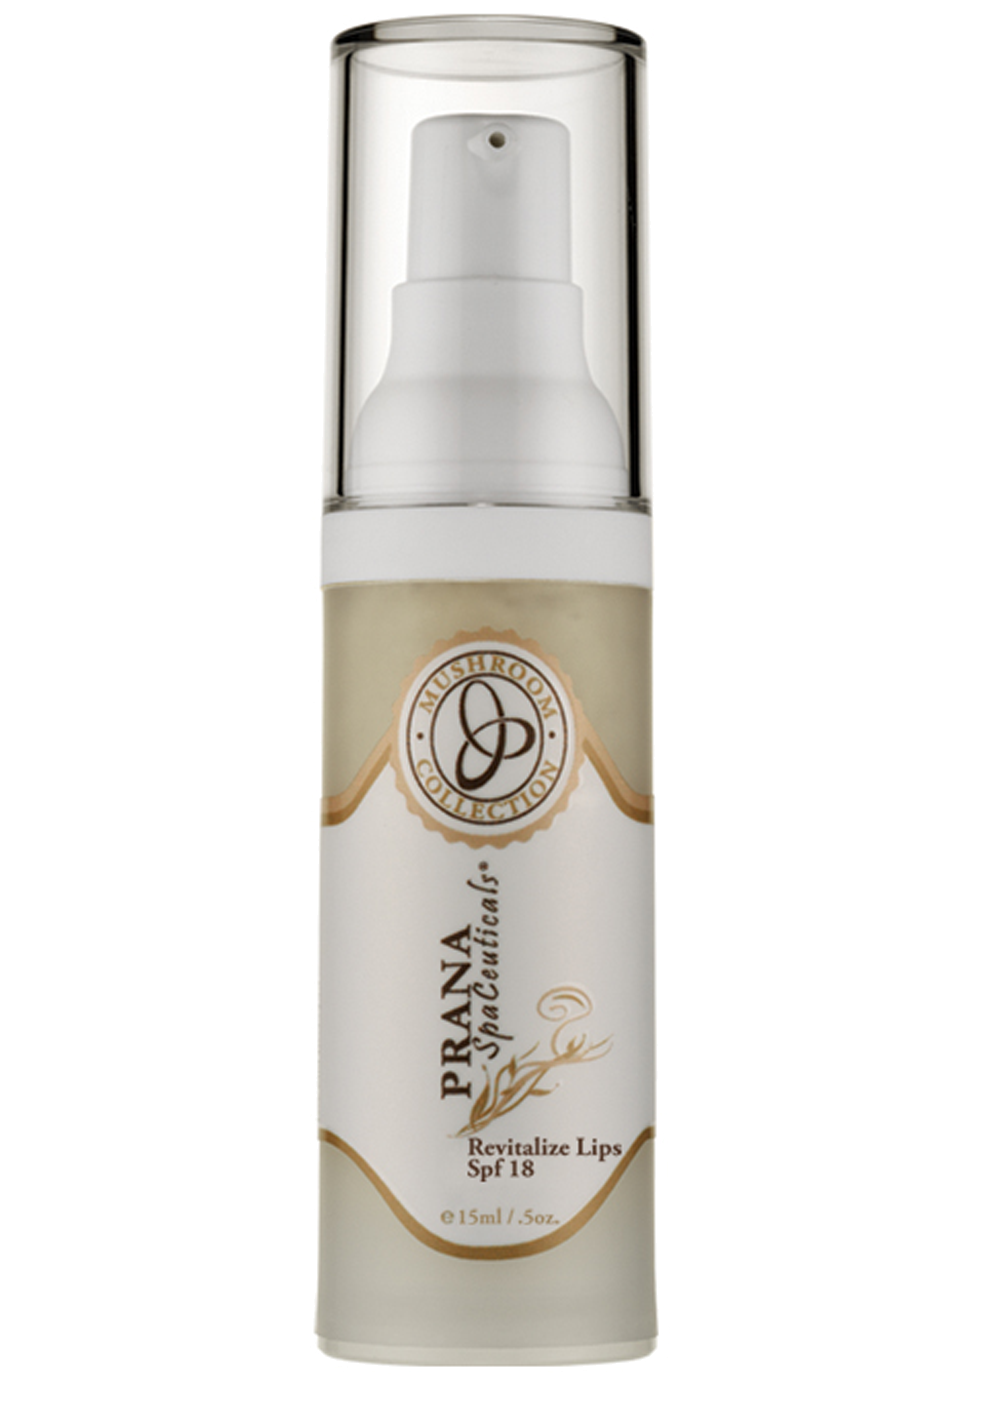 Revitalize Lips SPF 18